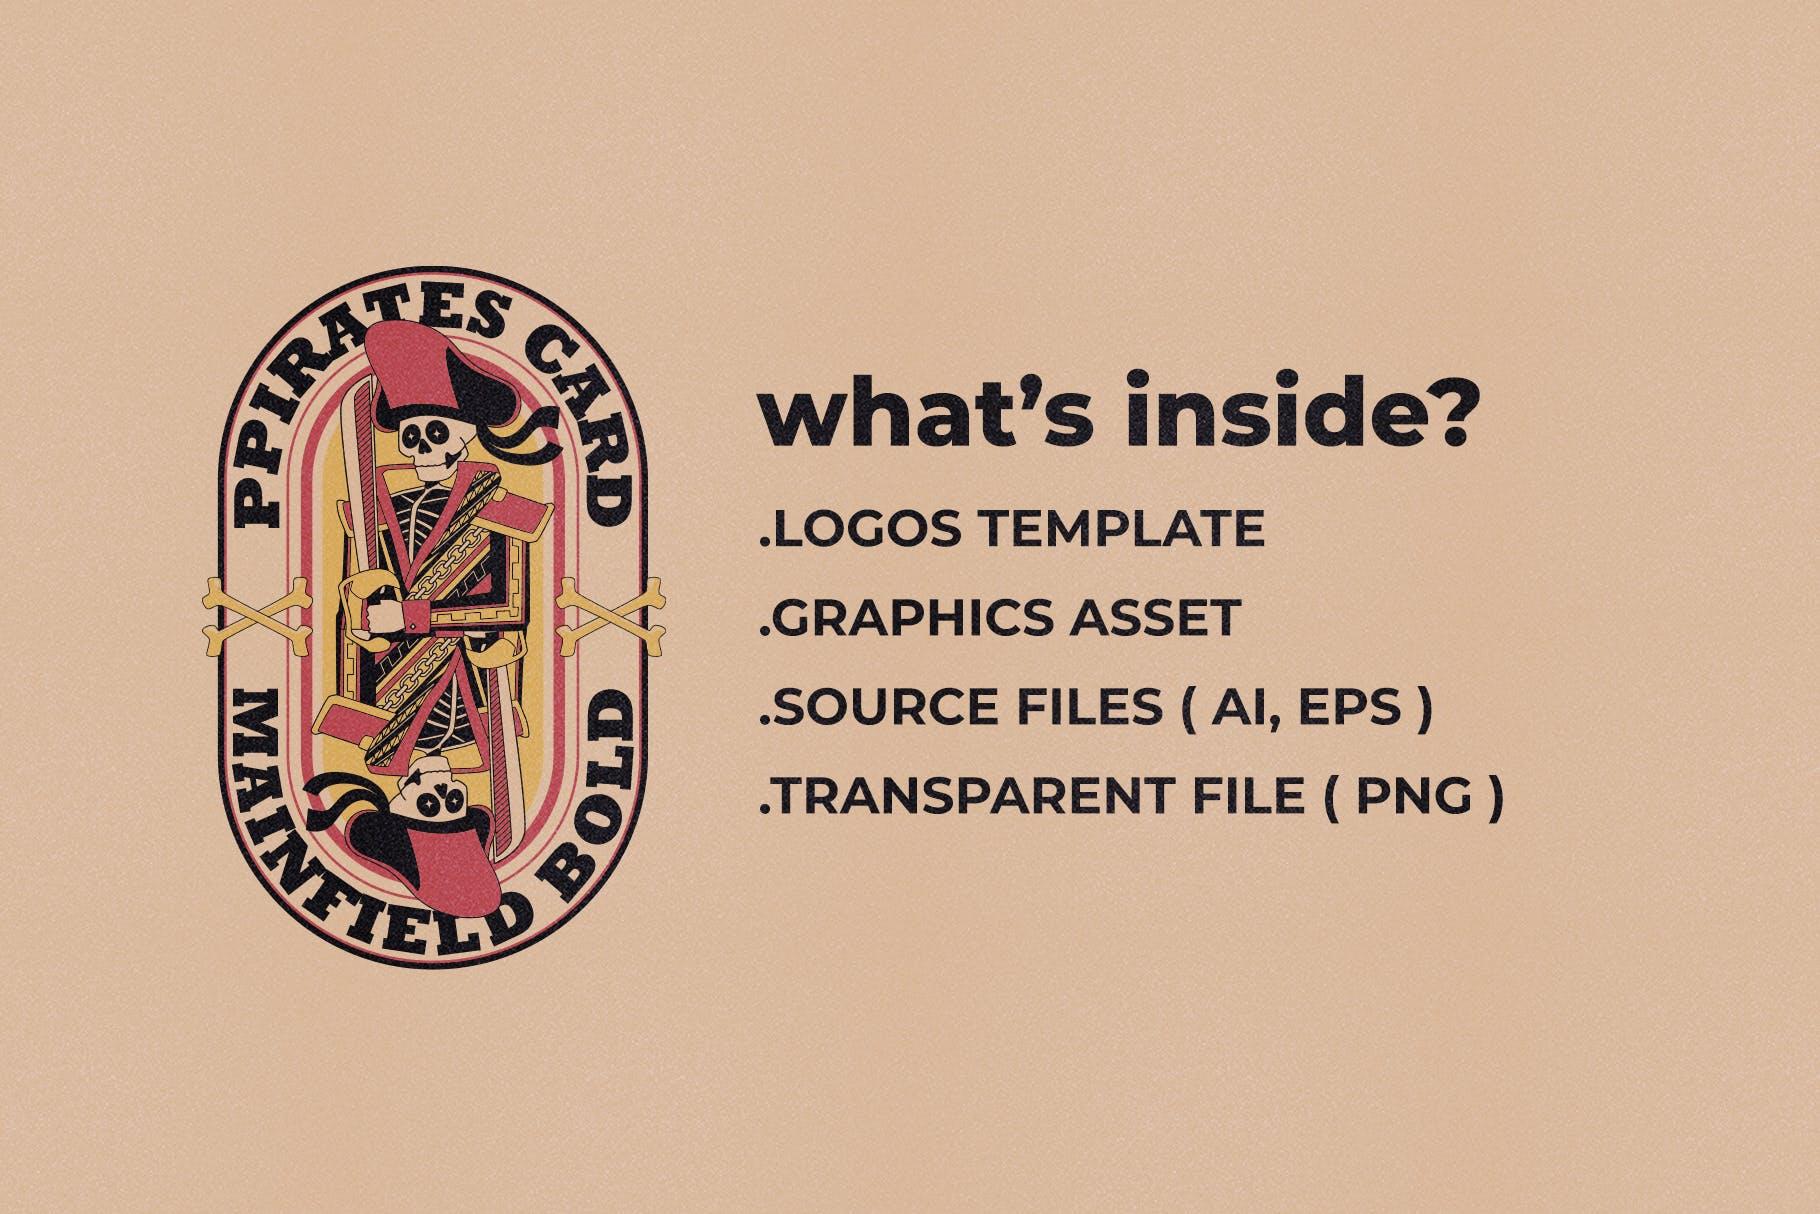 海盗元素徽标LOGO插图设计矢量素材 Illustration & Logo Pack V1插图(3)